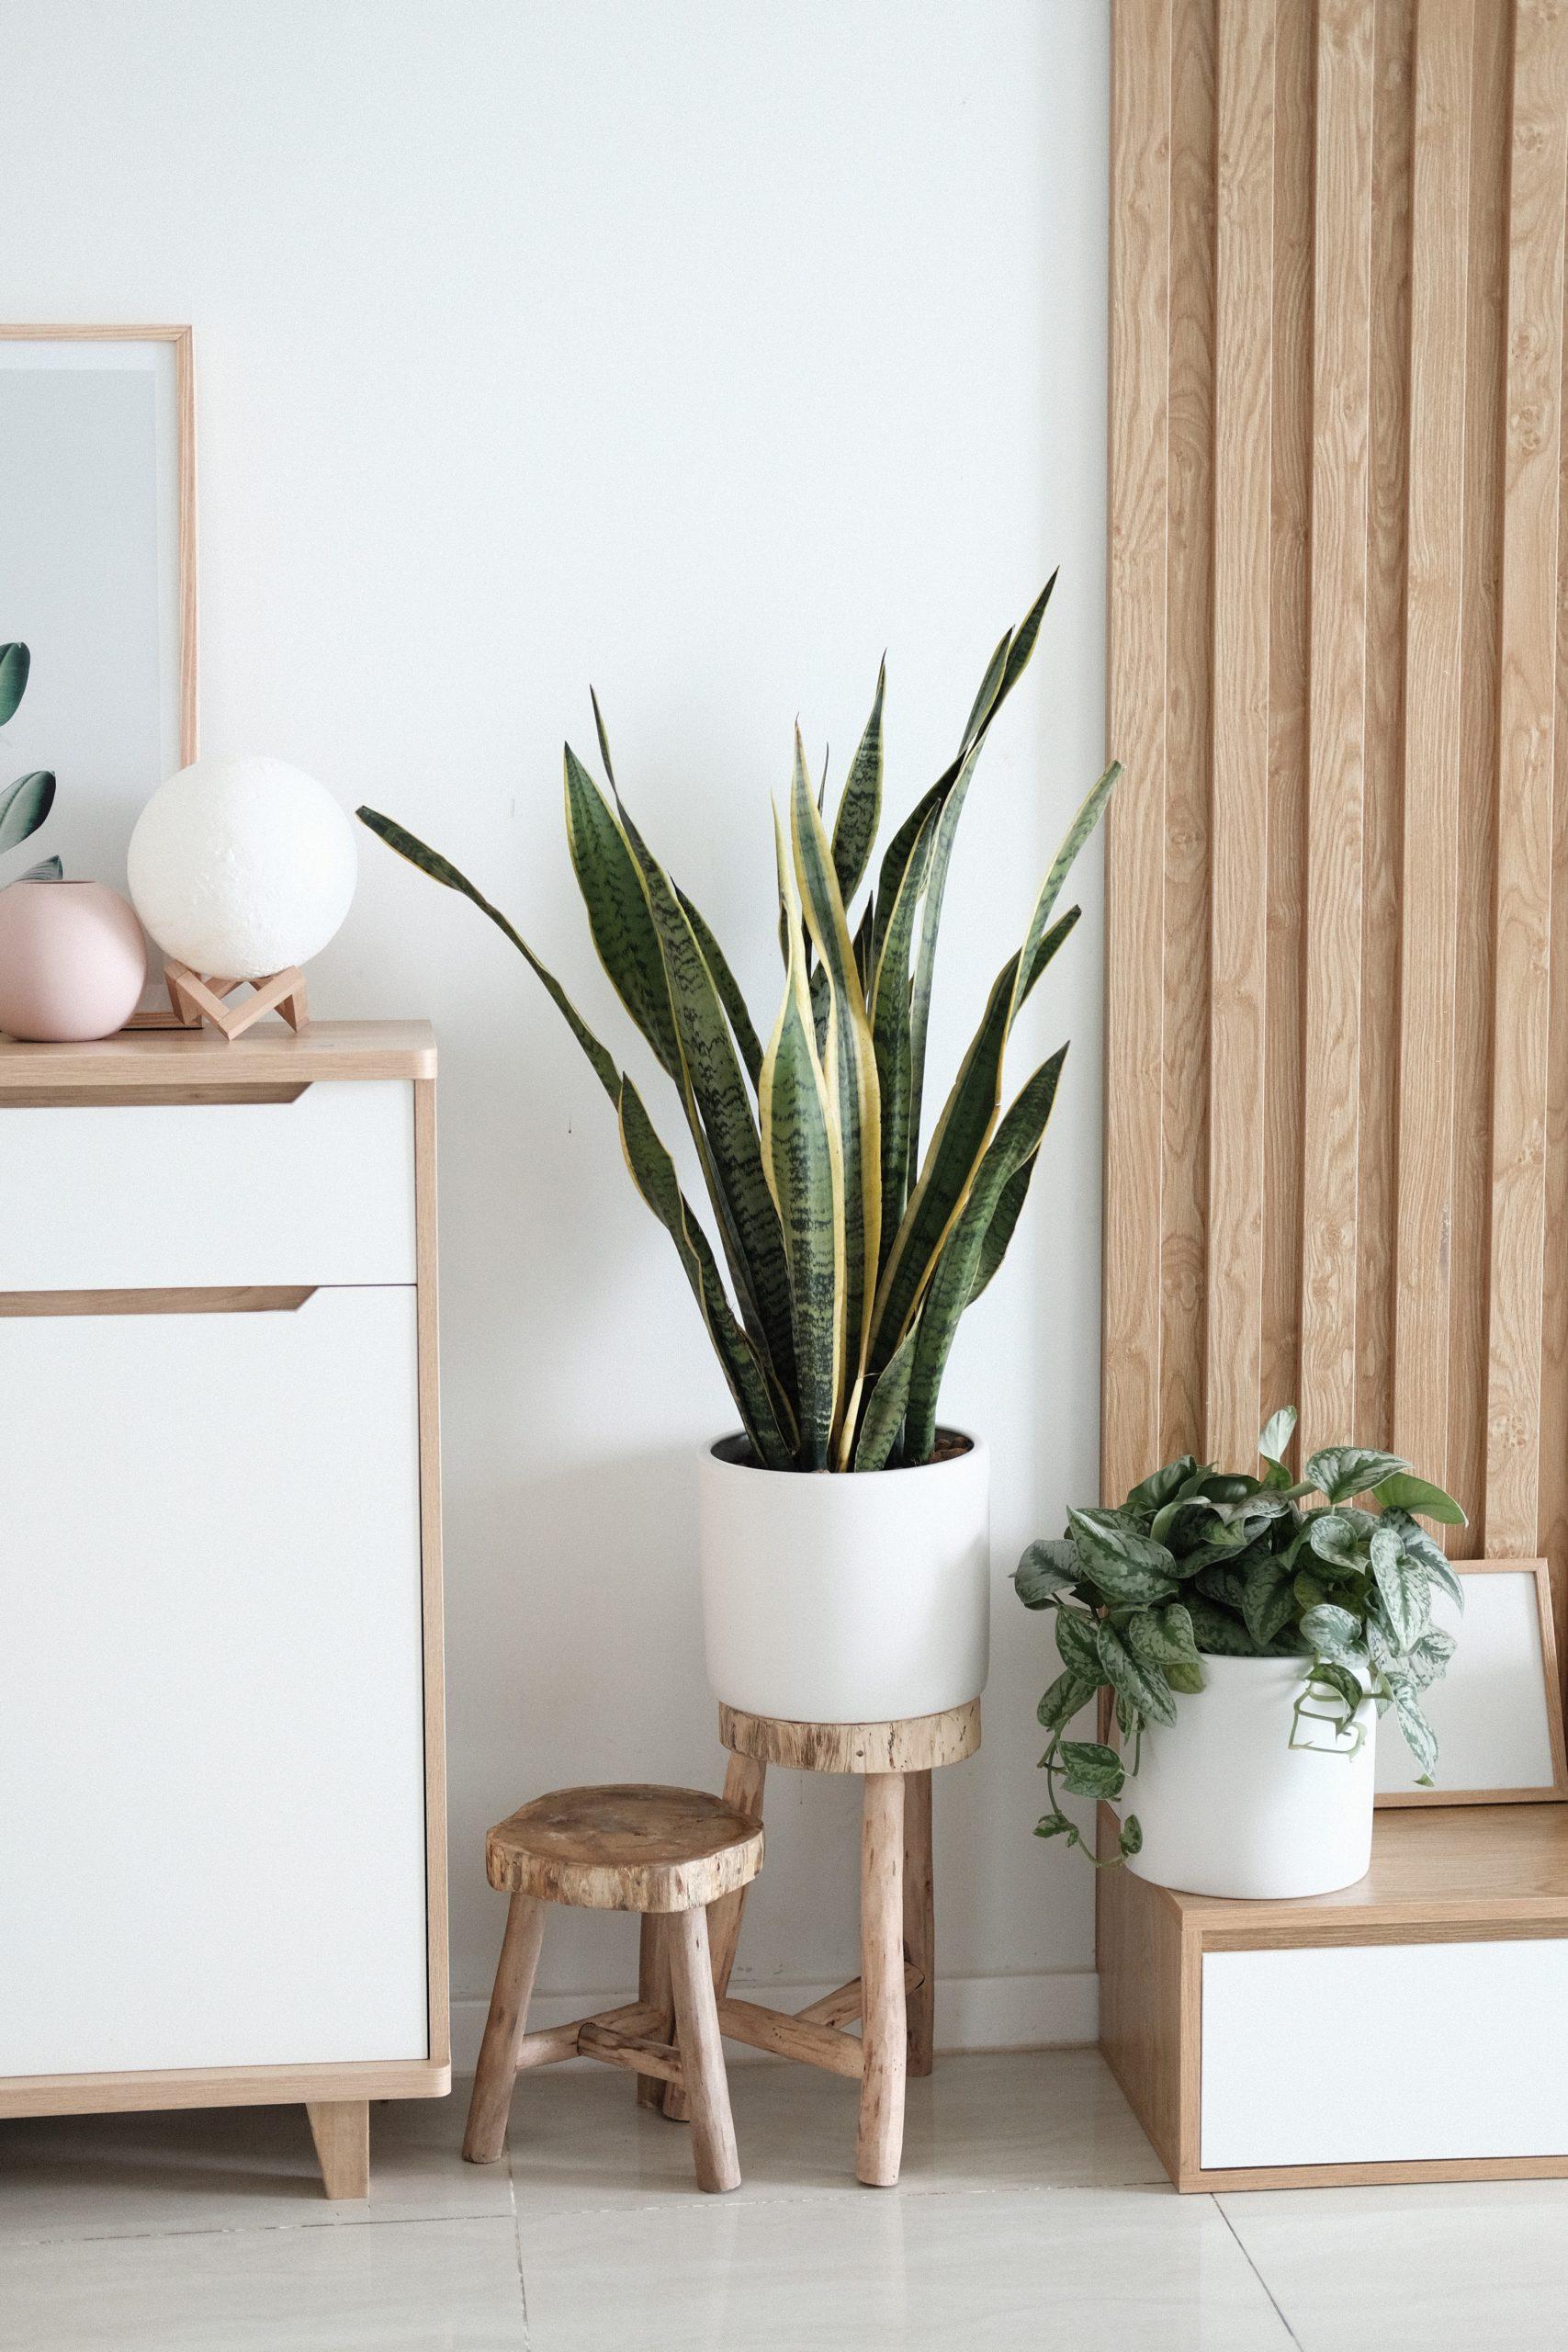 Bauträger | Home Staging für Bauträger in Solingen, Hilden & Haan